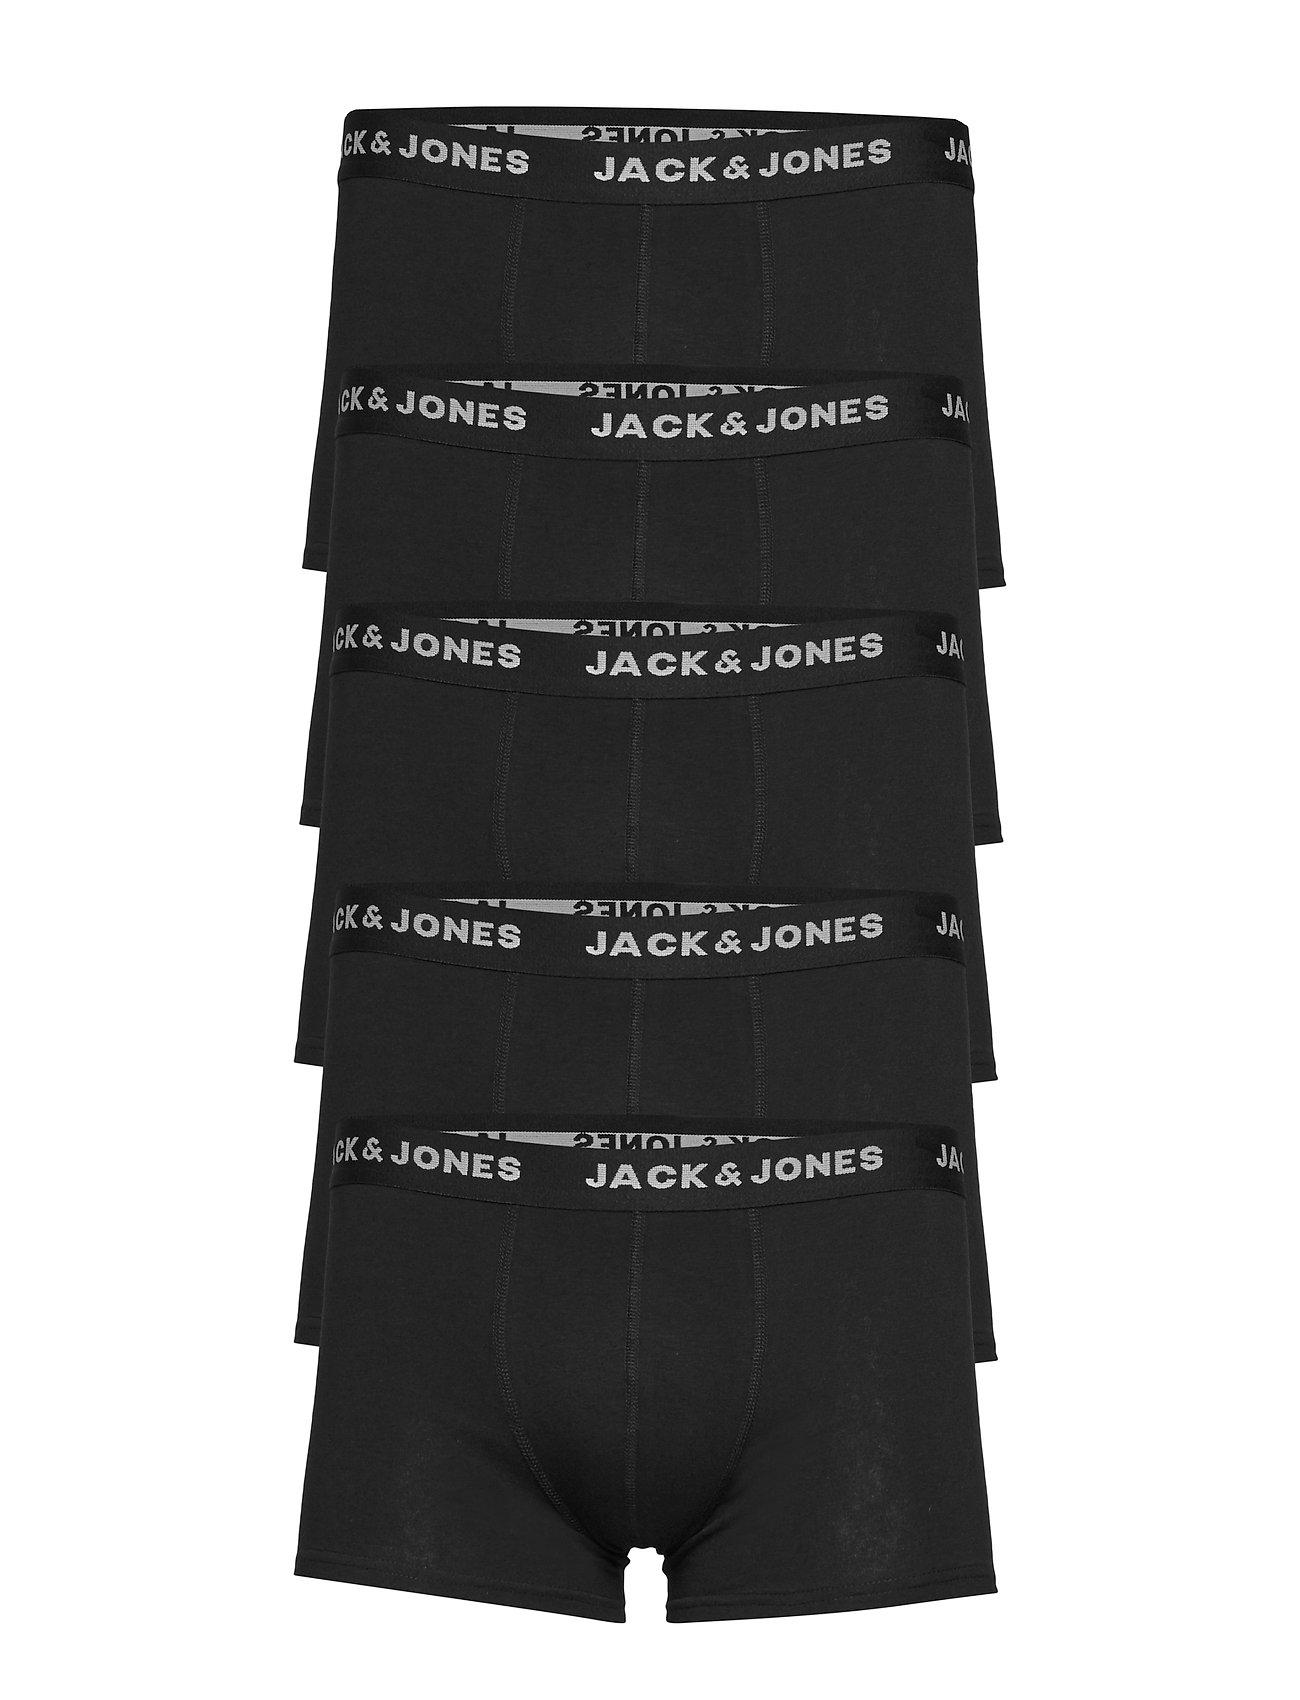 Image of Jachuey Trunks 5 Pack Noos Boxershorts Sort Jack & J S (3288858217)